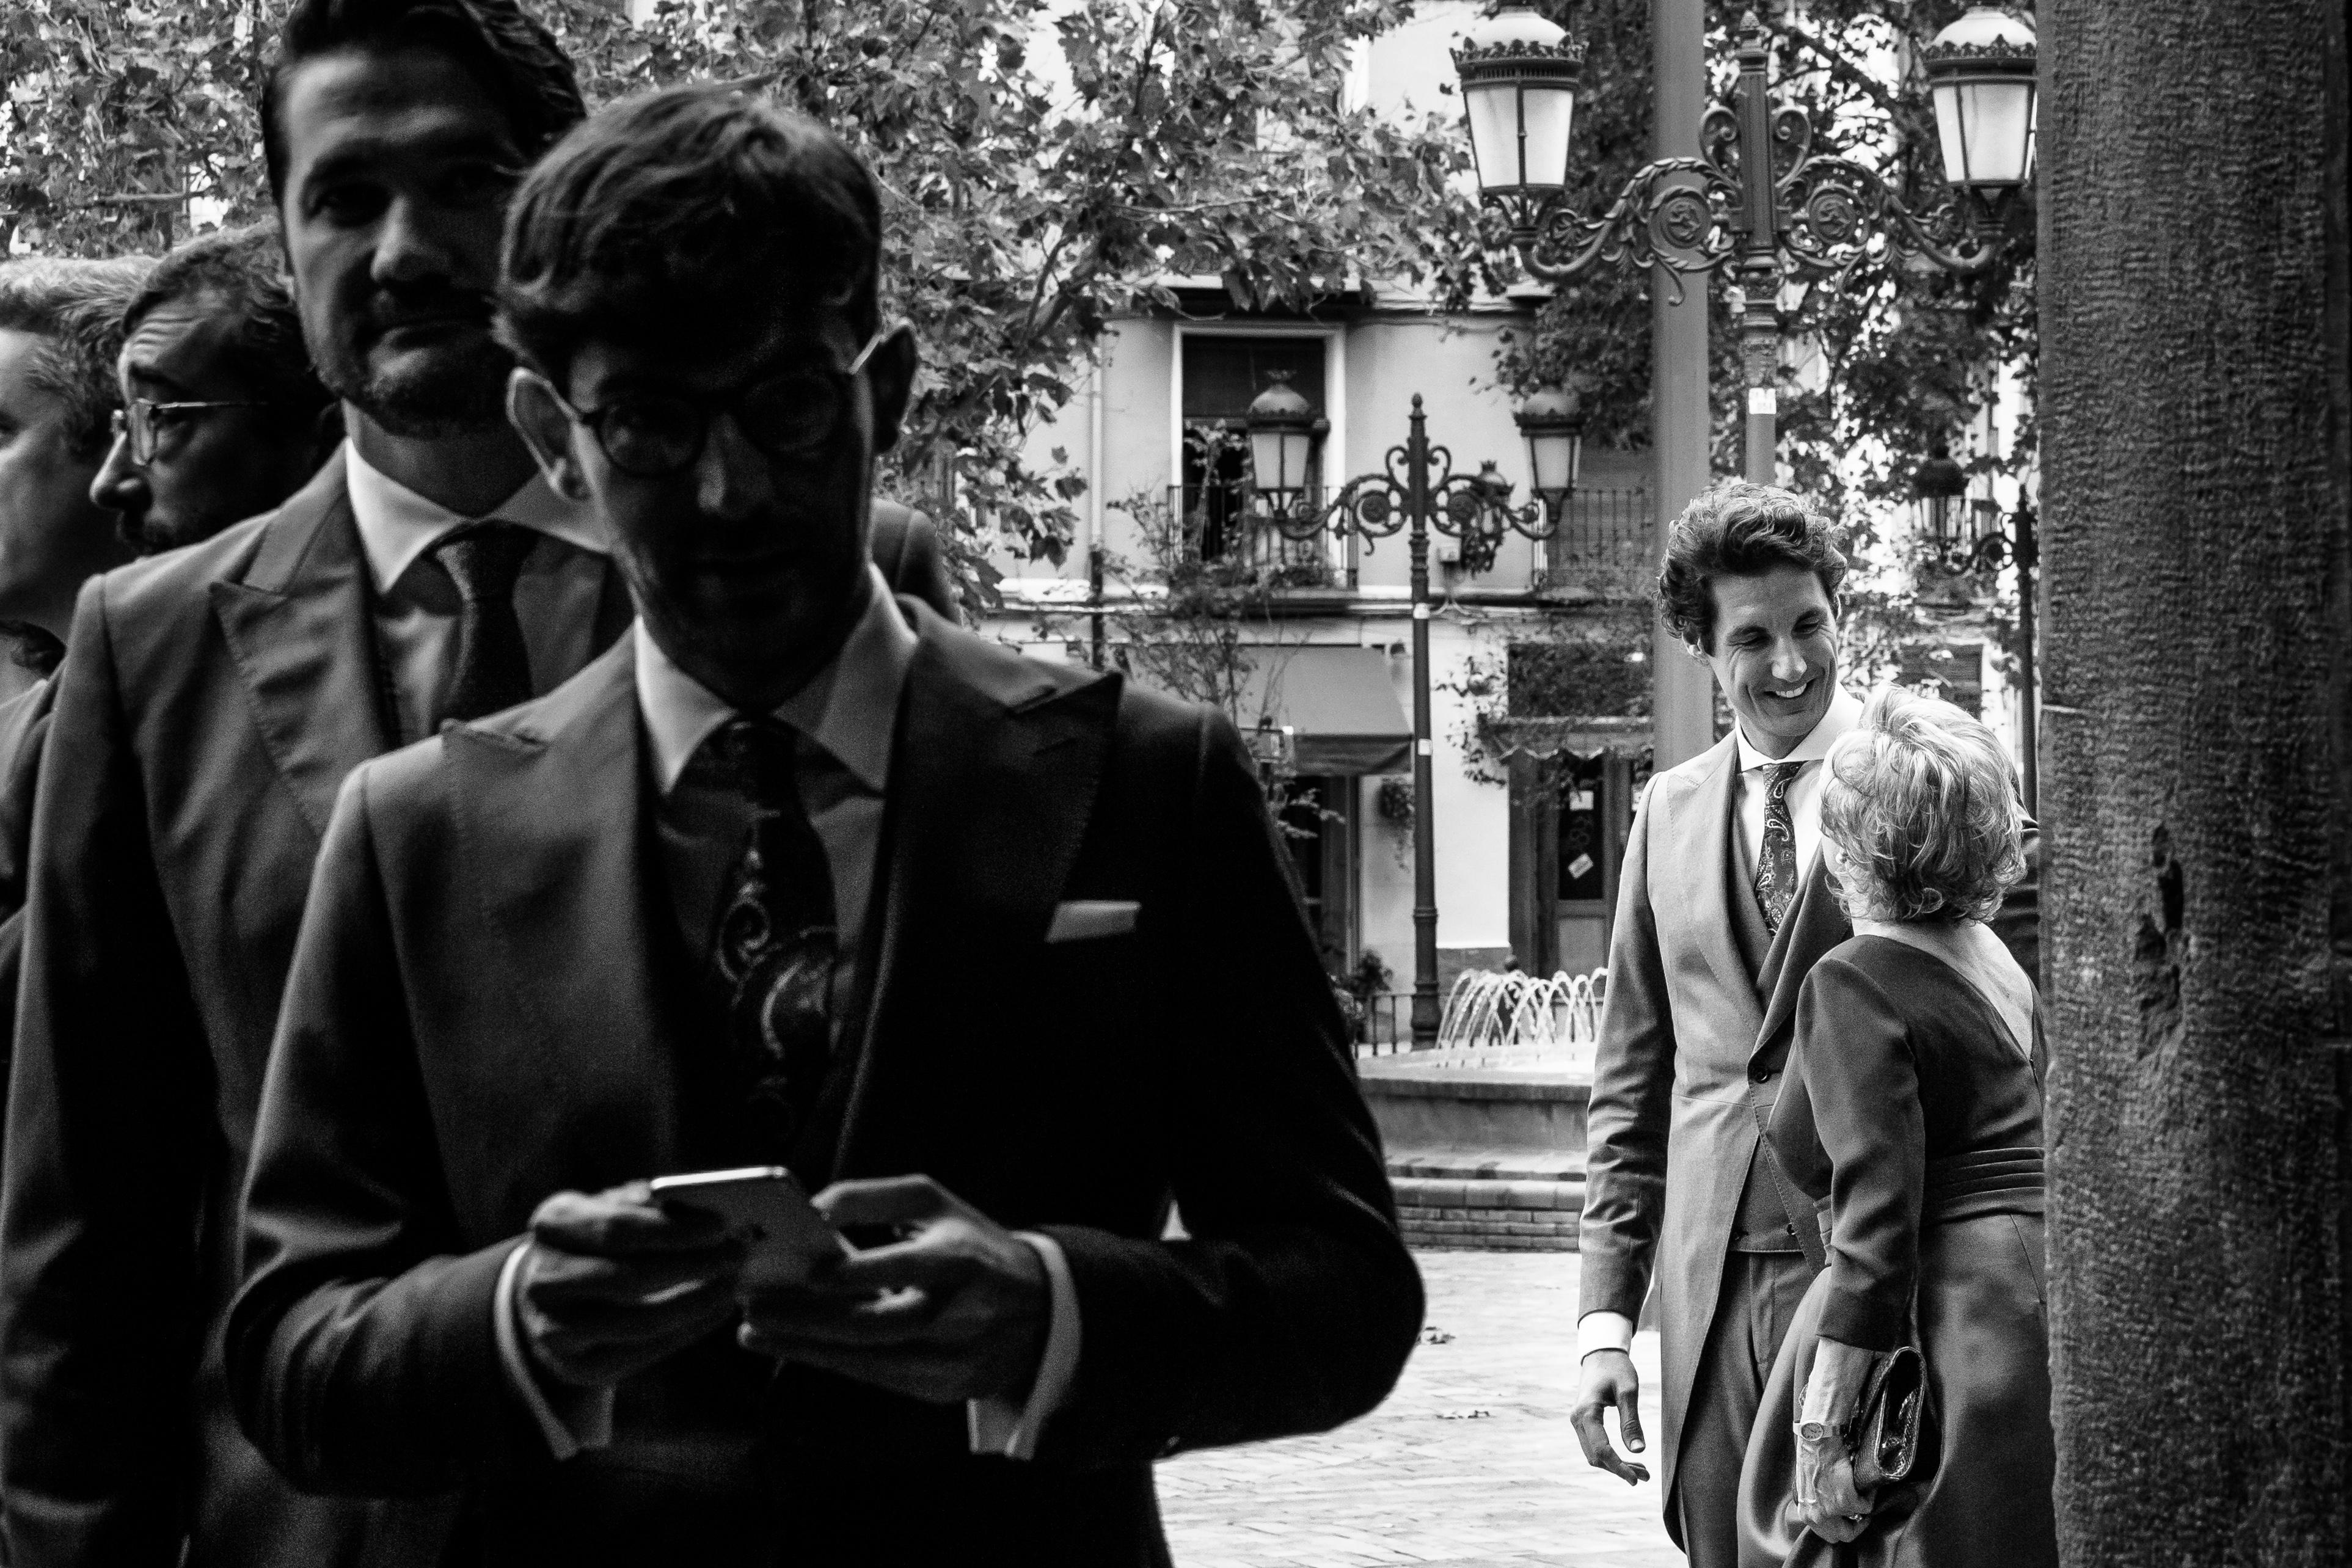 mandarina weddig, fotografos de boda, fotografo boda soria, fotografo boda barcelona, fotografo boda Madrid, fotografo boda lerida, fotografo boda Huesca_23